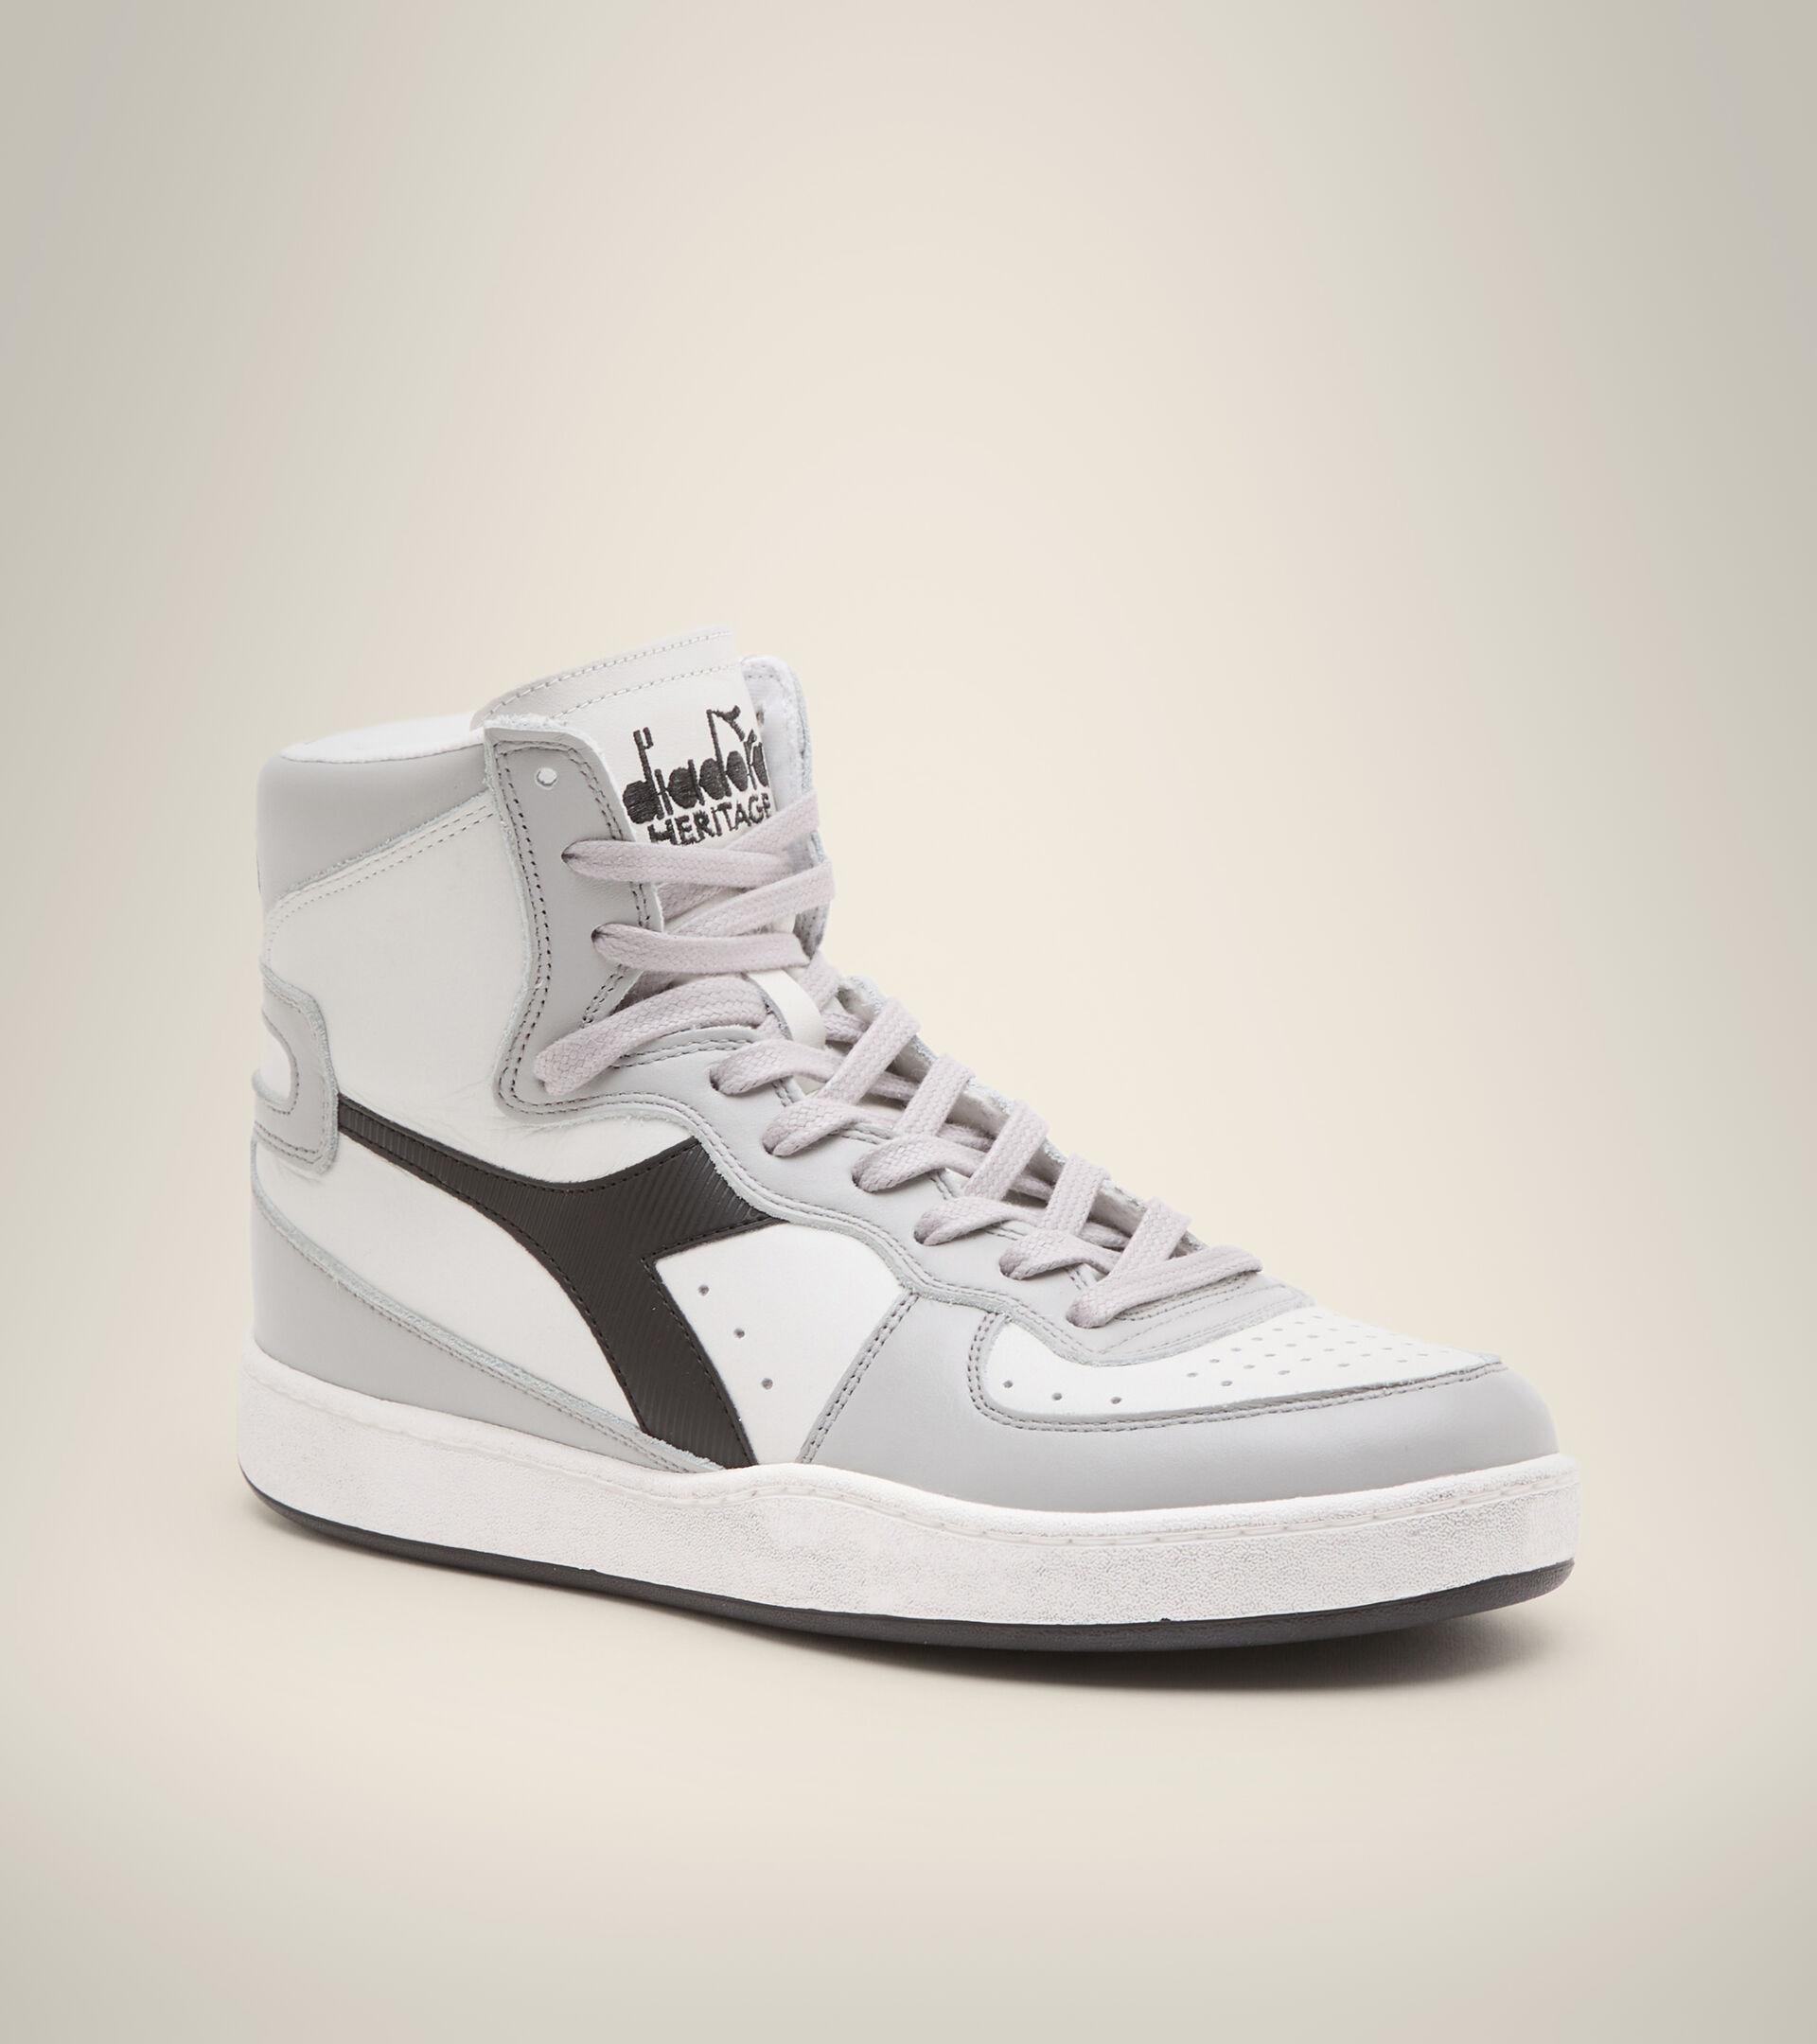 Footwear Heritage UNISEX MI BASKET USED BIANCO/GRIGIO GRATTACIELO/NERO Diadora